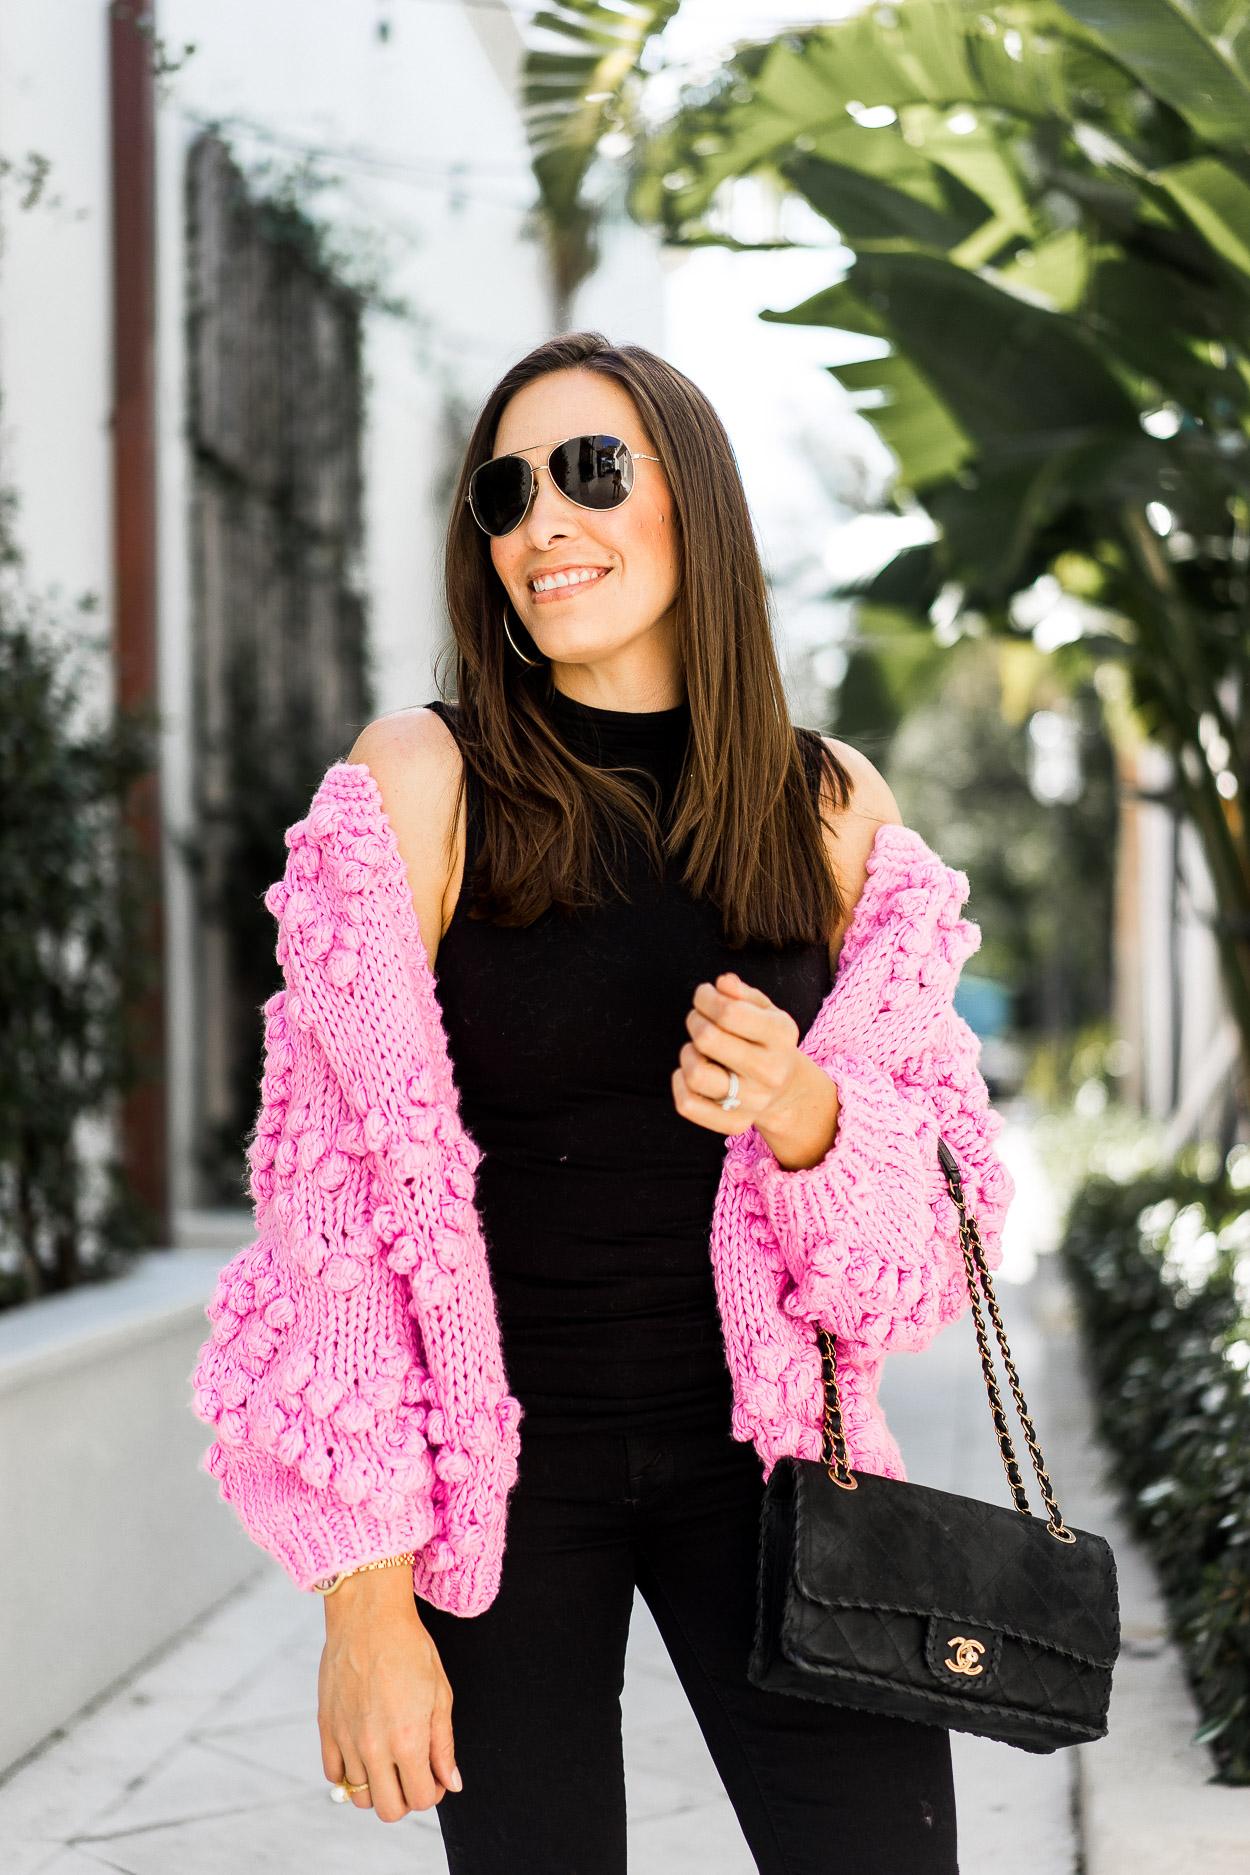 Wear a bright pink pom pom cardigan for easy weekend style like fashion blogger Amanda of A Glam Lifestyle